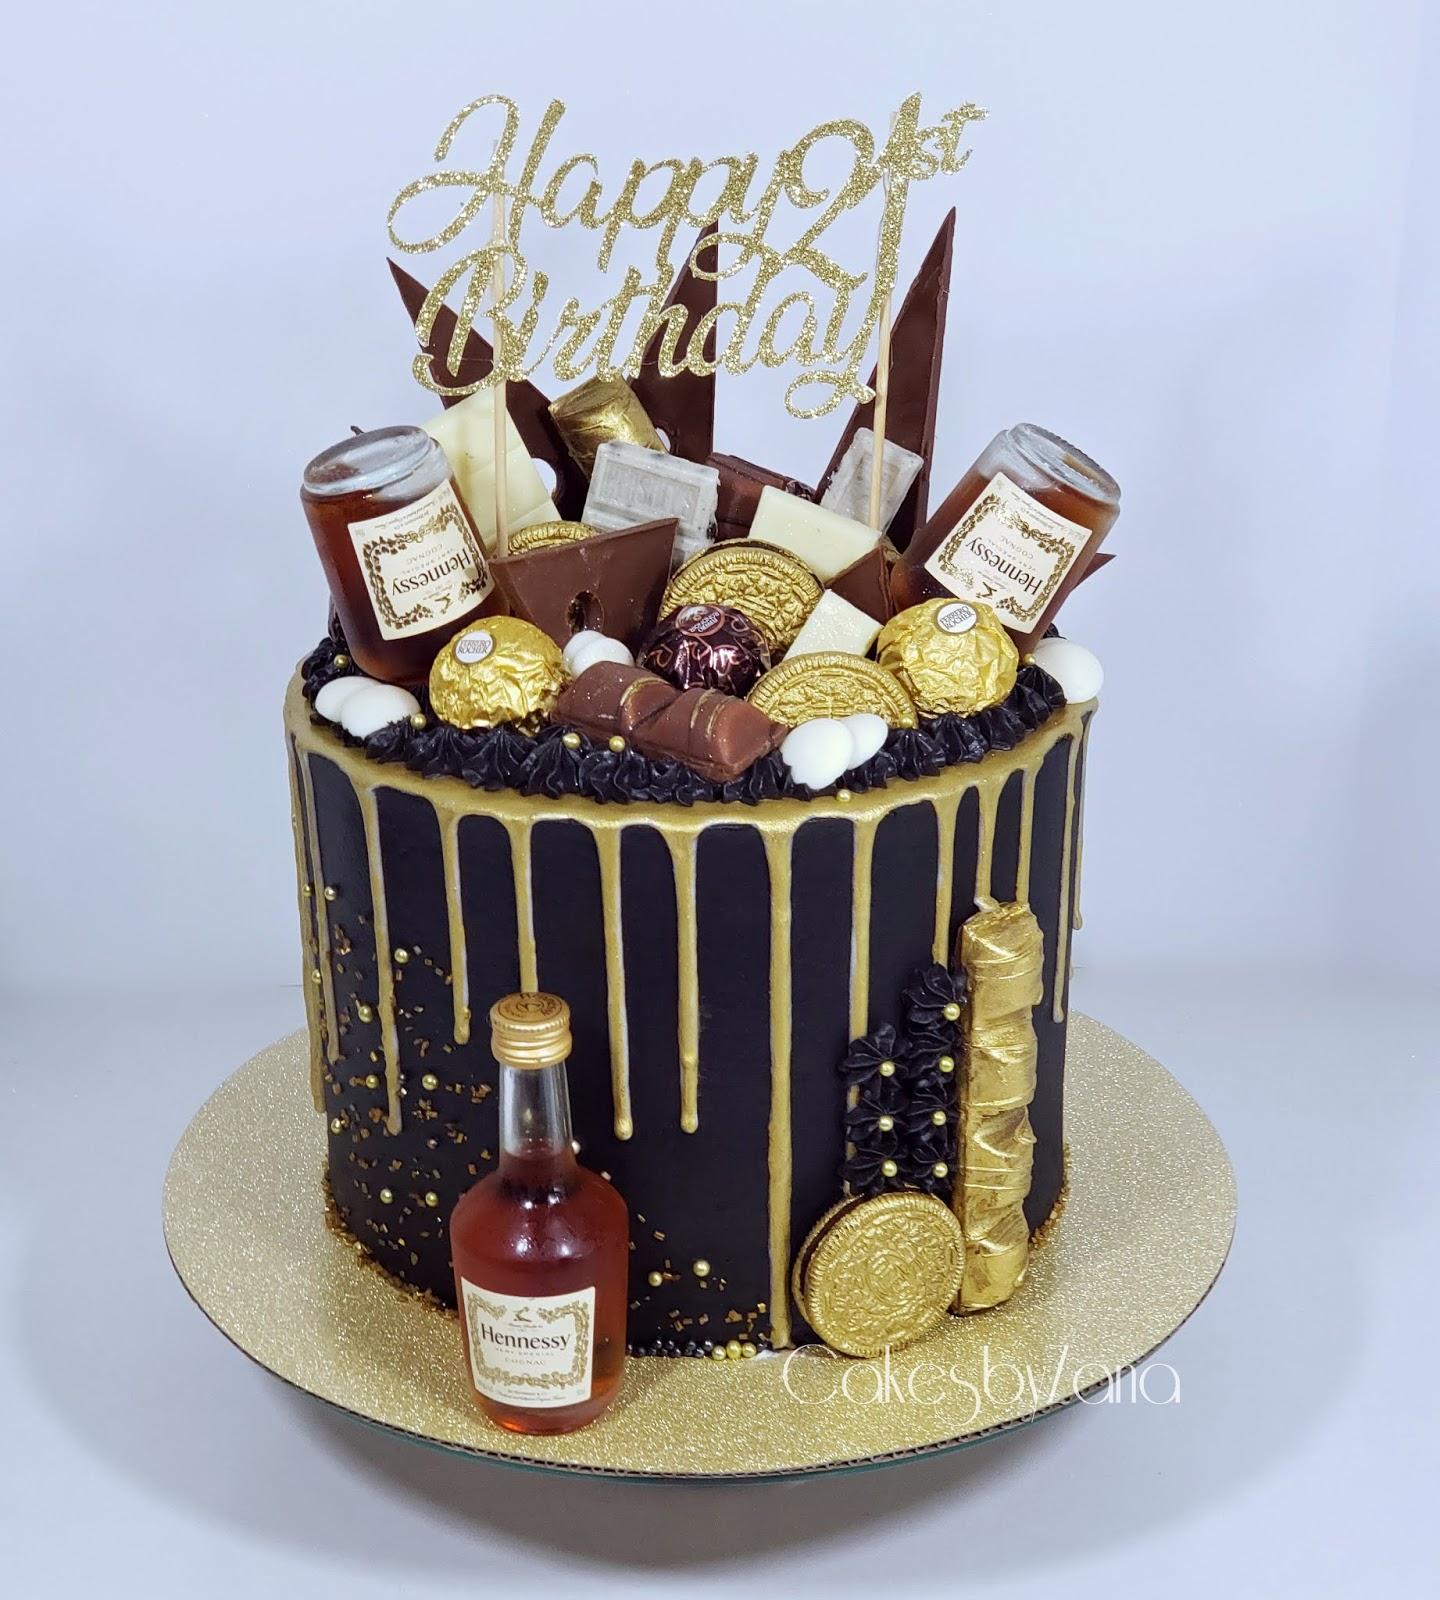 Outstanding Cakesbyzana 21St Birthday Drip Cake Funny Birthday Cards Online Alyptdamsfinfo